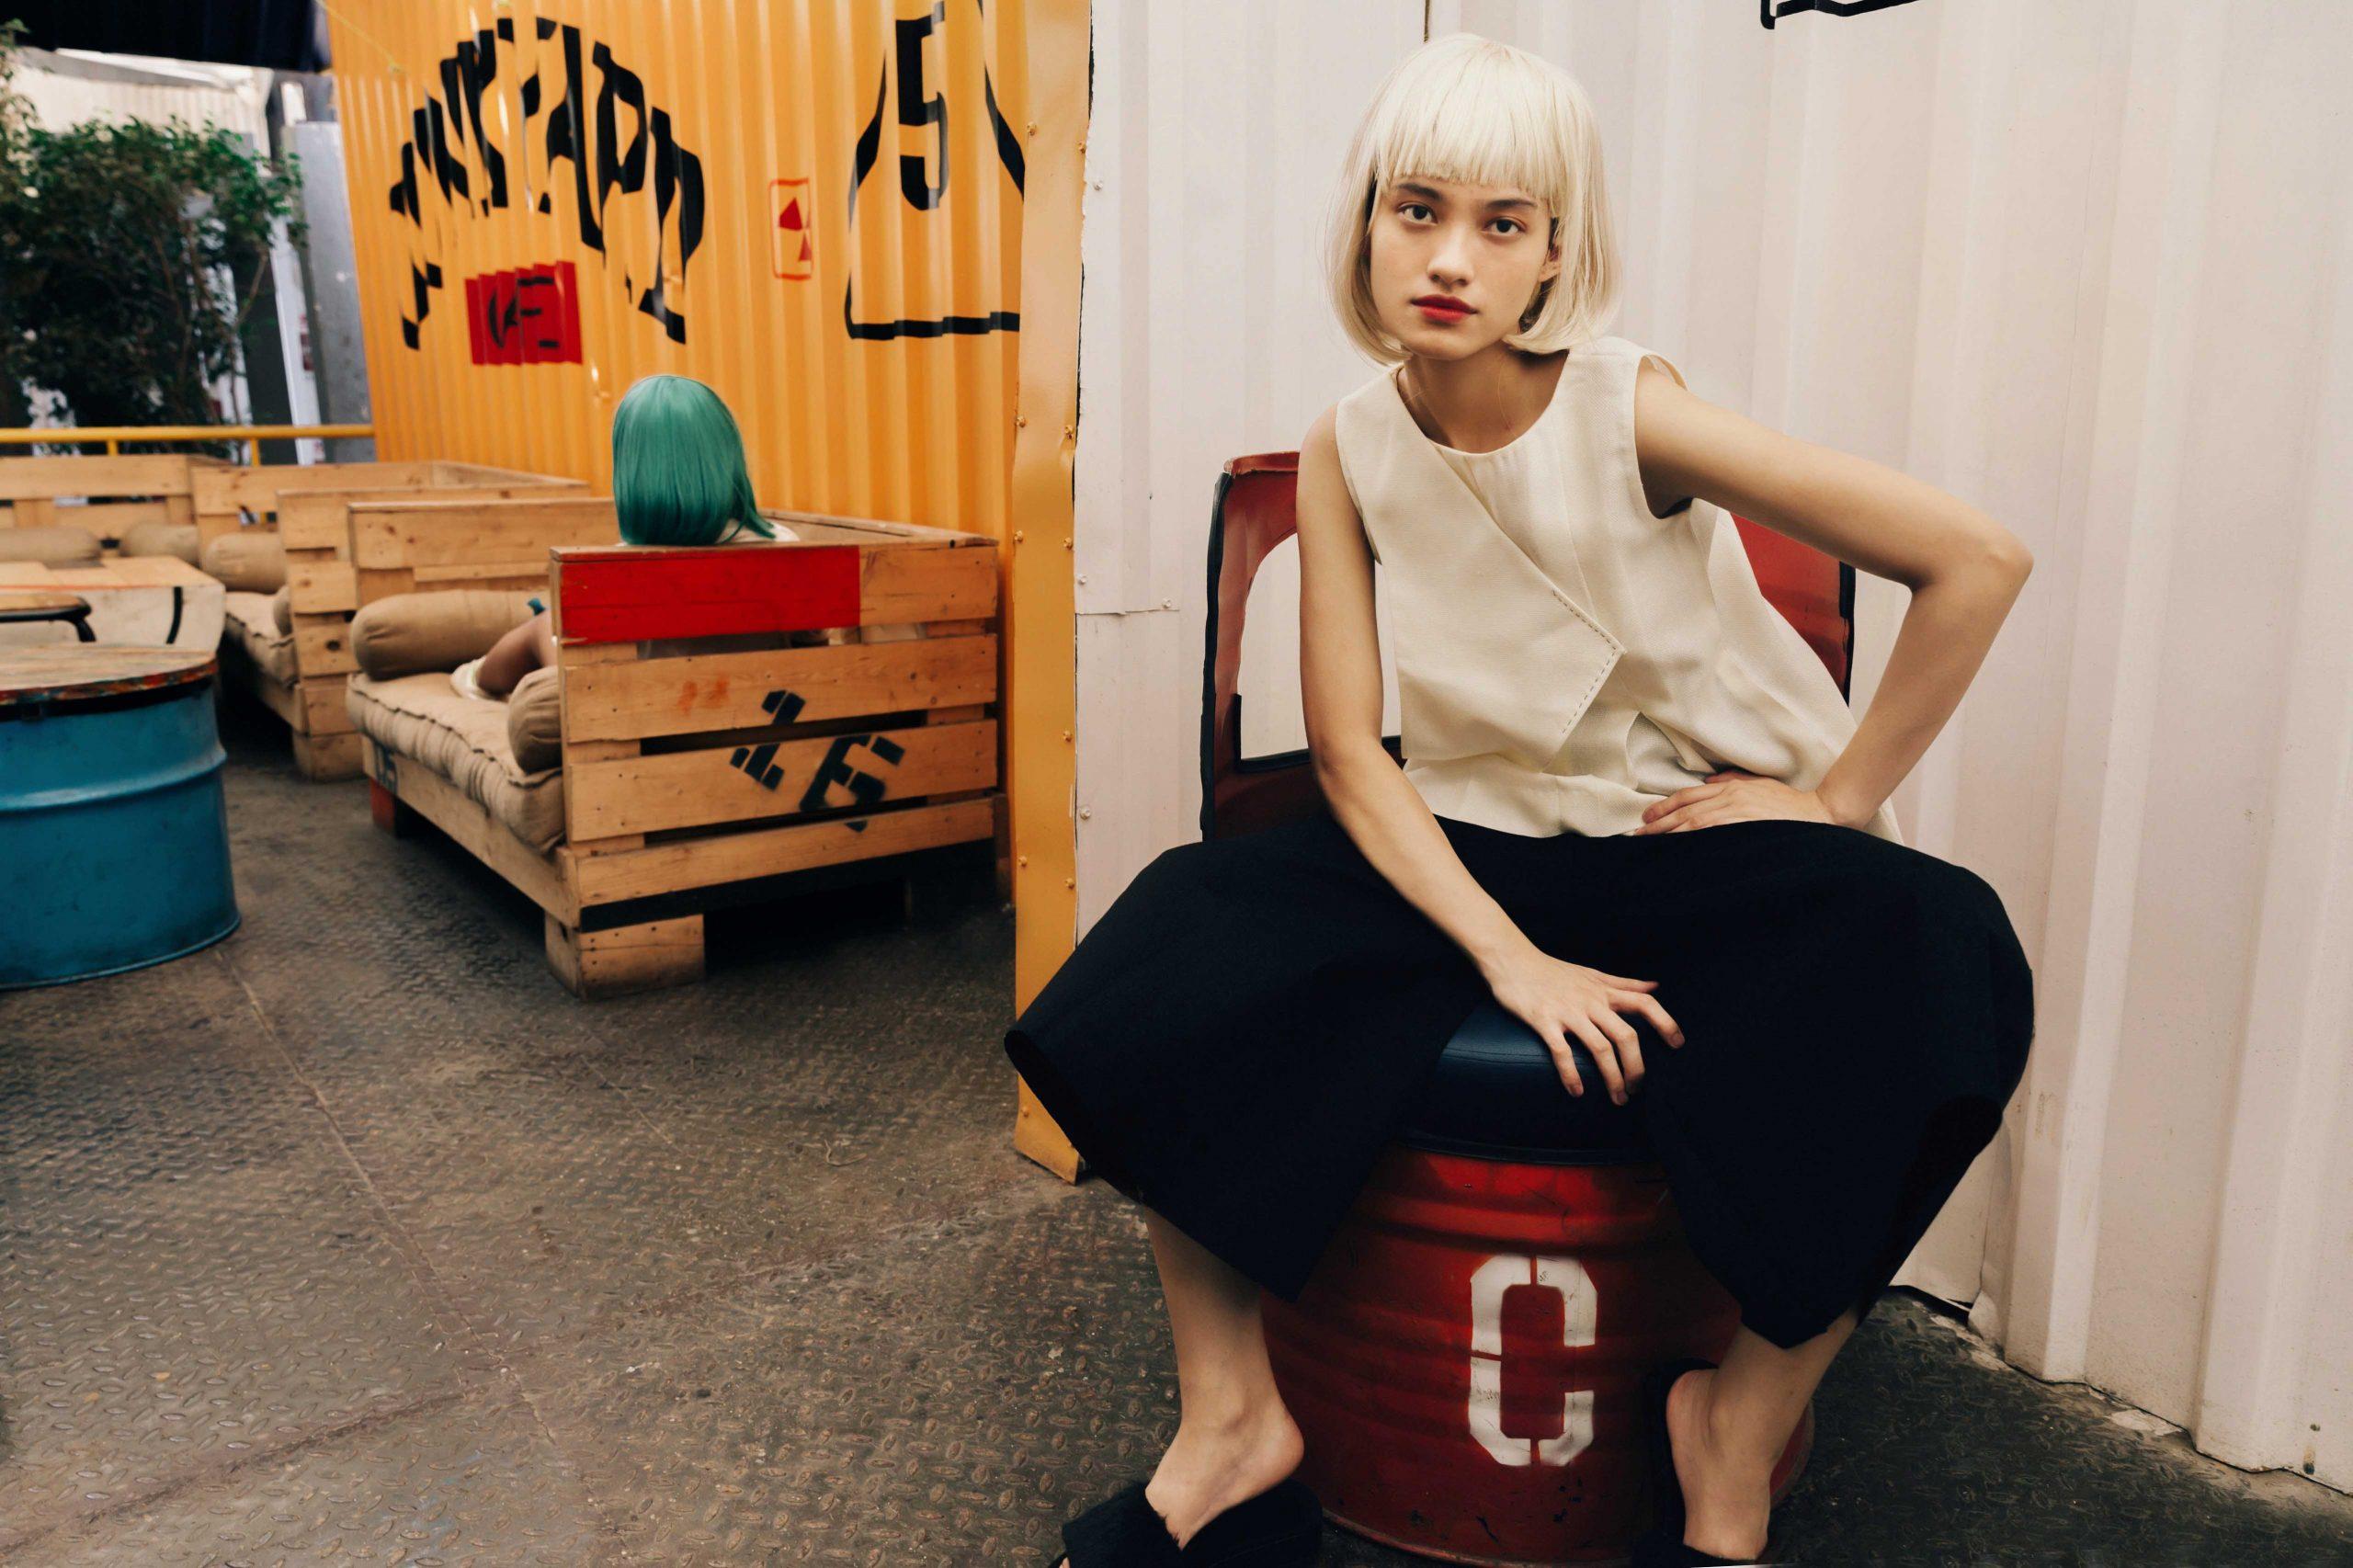 Streets of Funk by Soumya Iyer Streets of Funk by Soumya Iyer Vanity Teen 虚荣青年 Menswear & new faces magazine